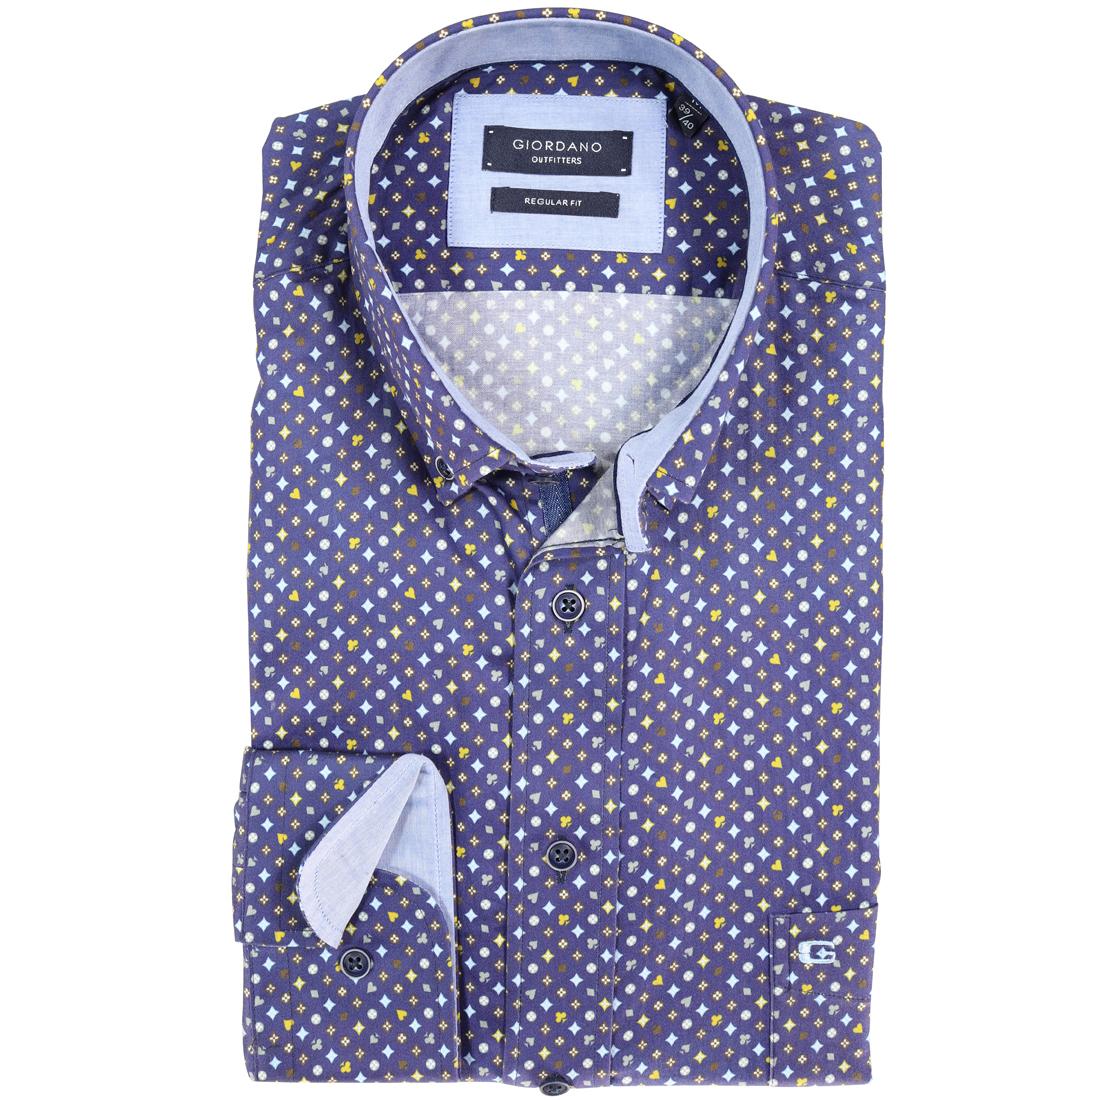 Giordano overhemd Regular Fit 827025 in het Blauw